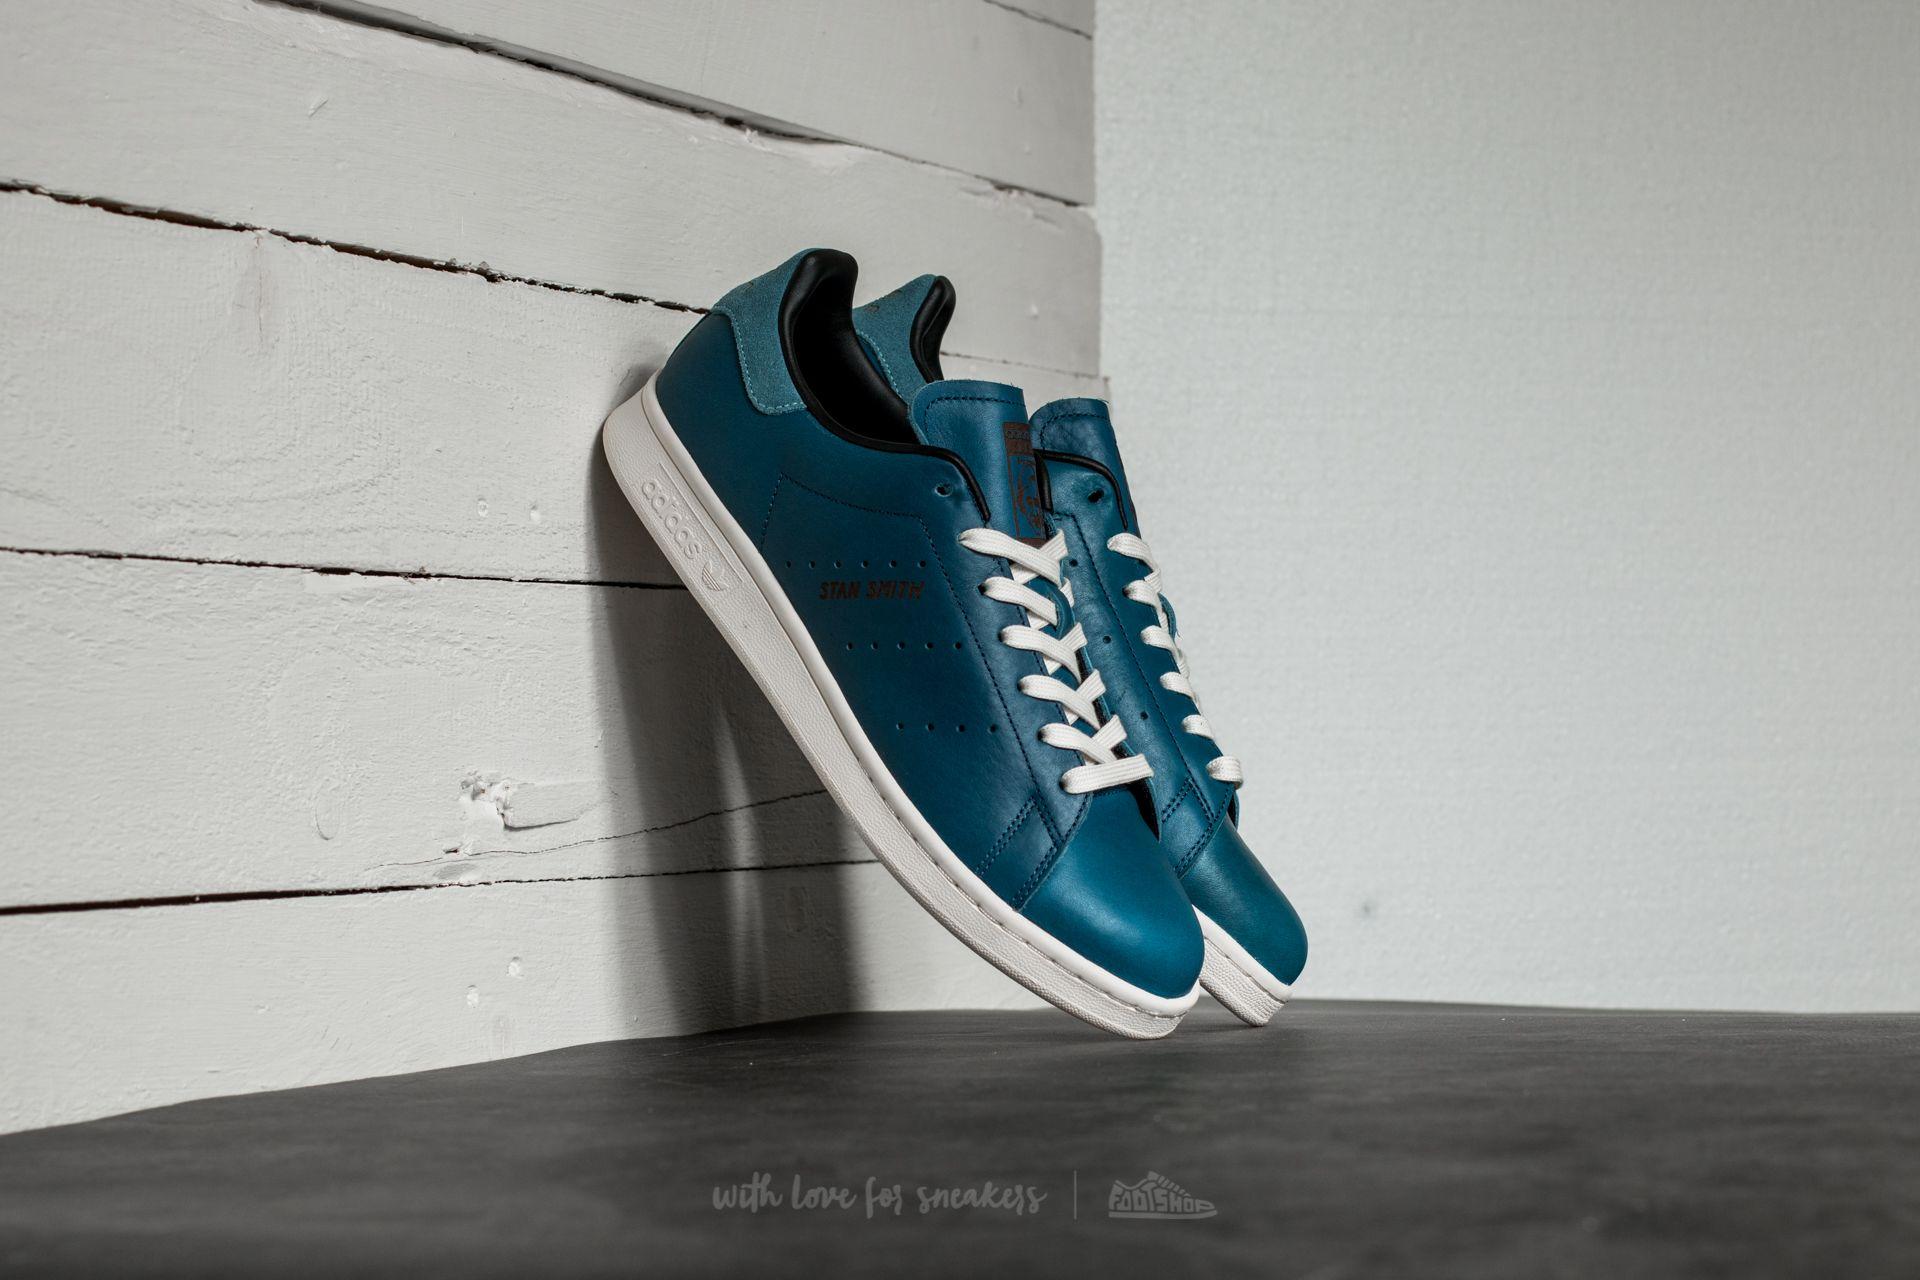 43d4a340687e adidas Stan Smith Blue  Collegiate Navy  Chalk White